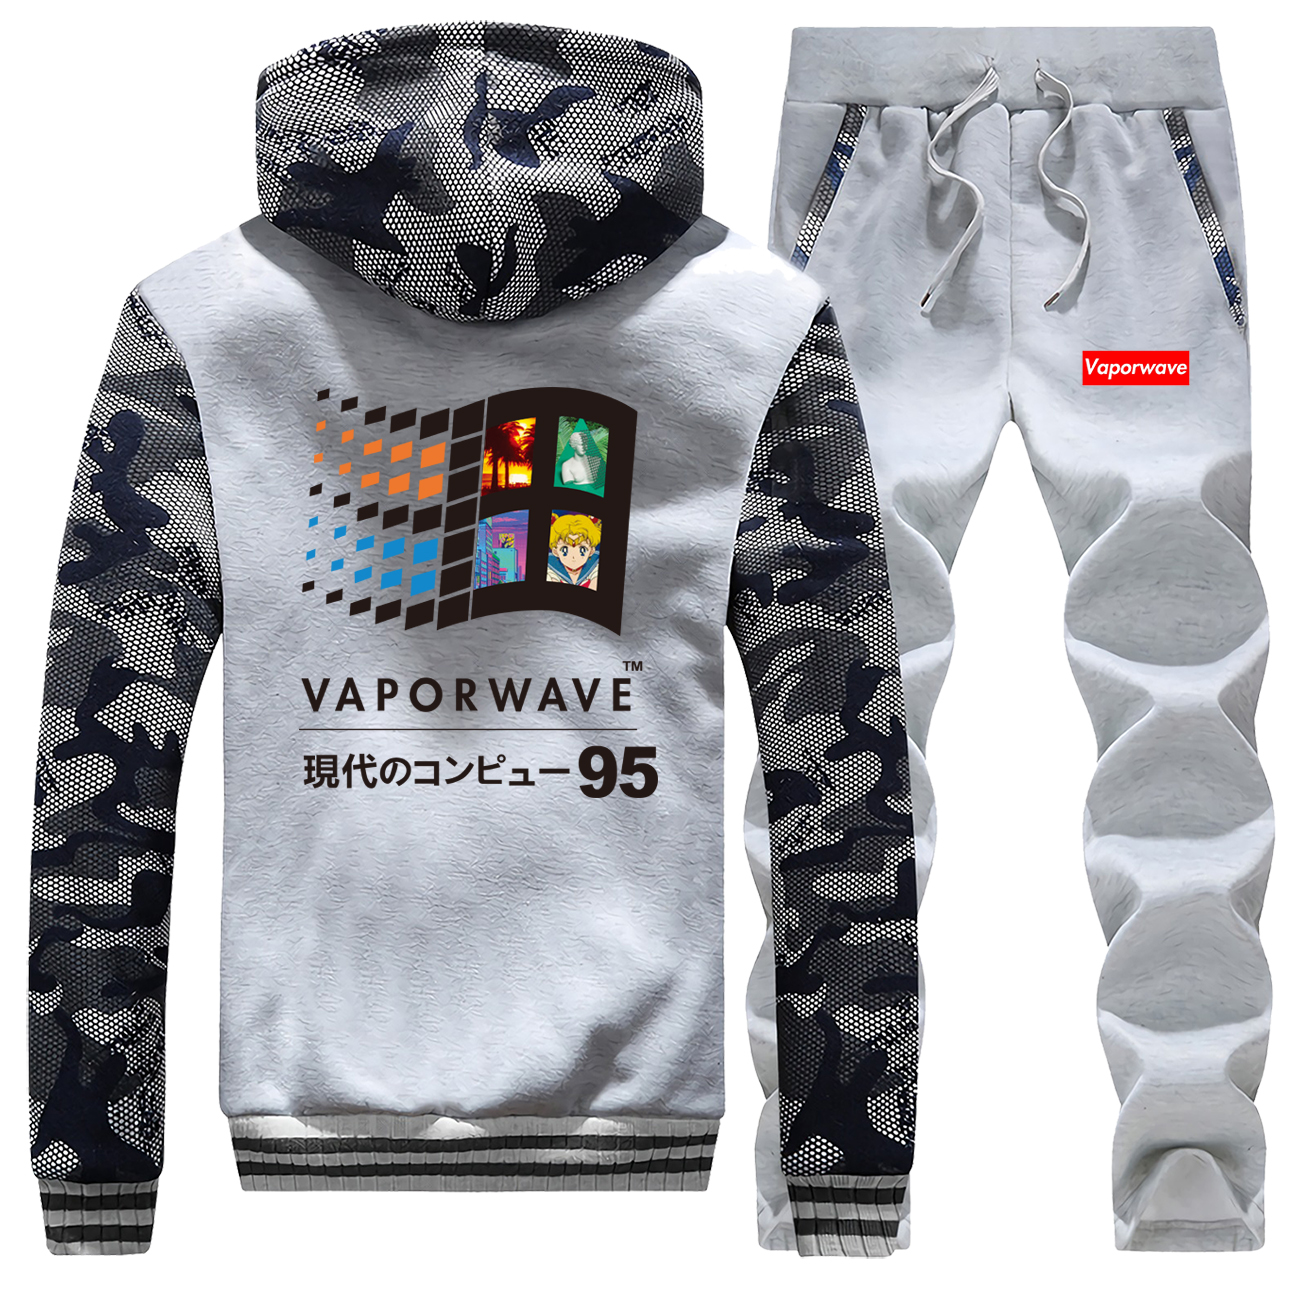 Japanese Anime Coat Hip Hop Tracksuit Aesthetic Vaporwave Vintage Hoodies Thick Sweatshirt Men Hip Hop Jacket+Pants 2 Piece Sets